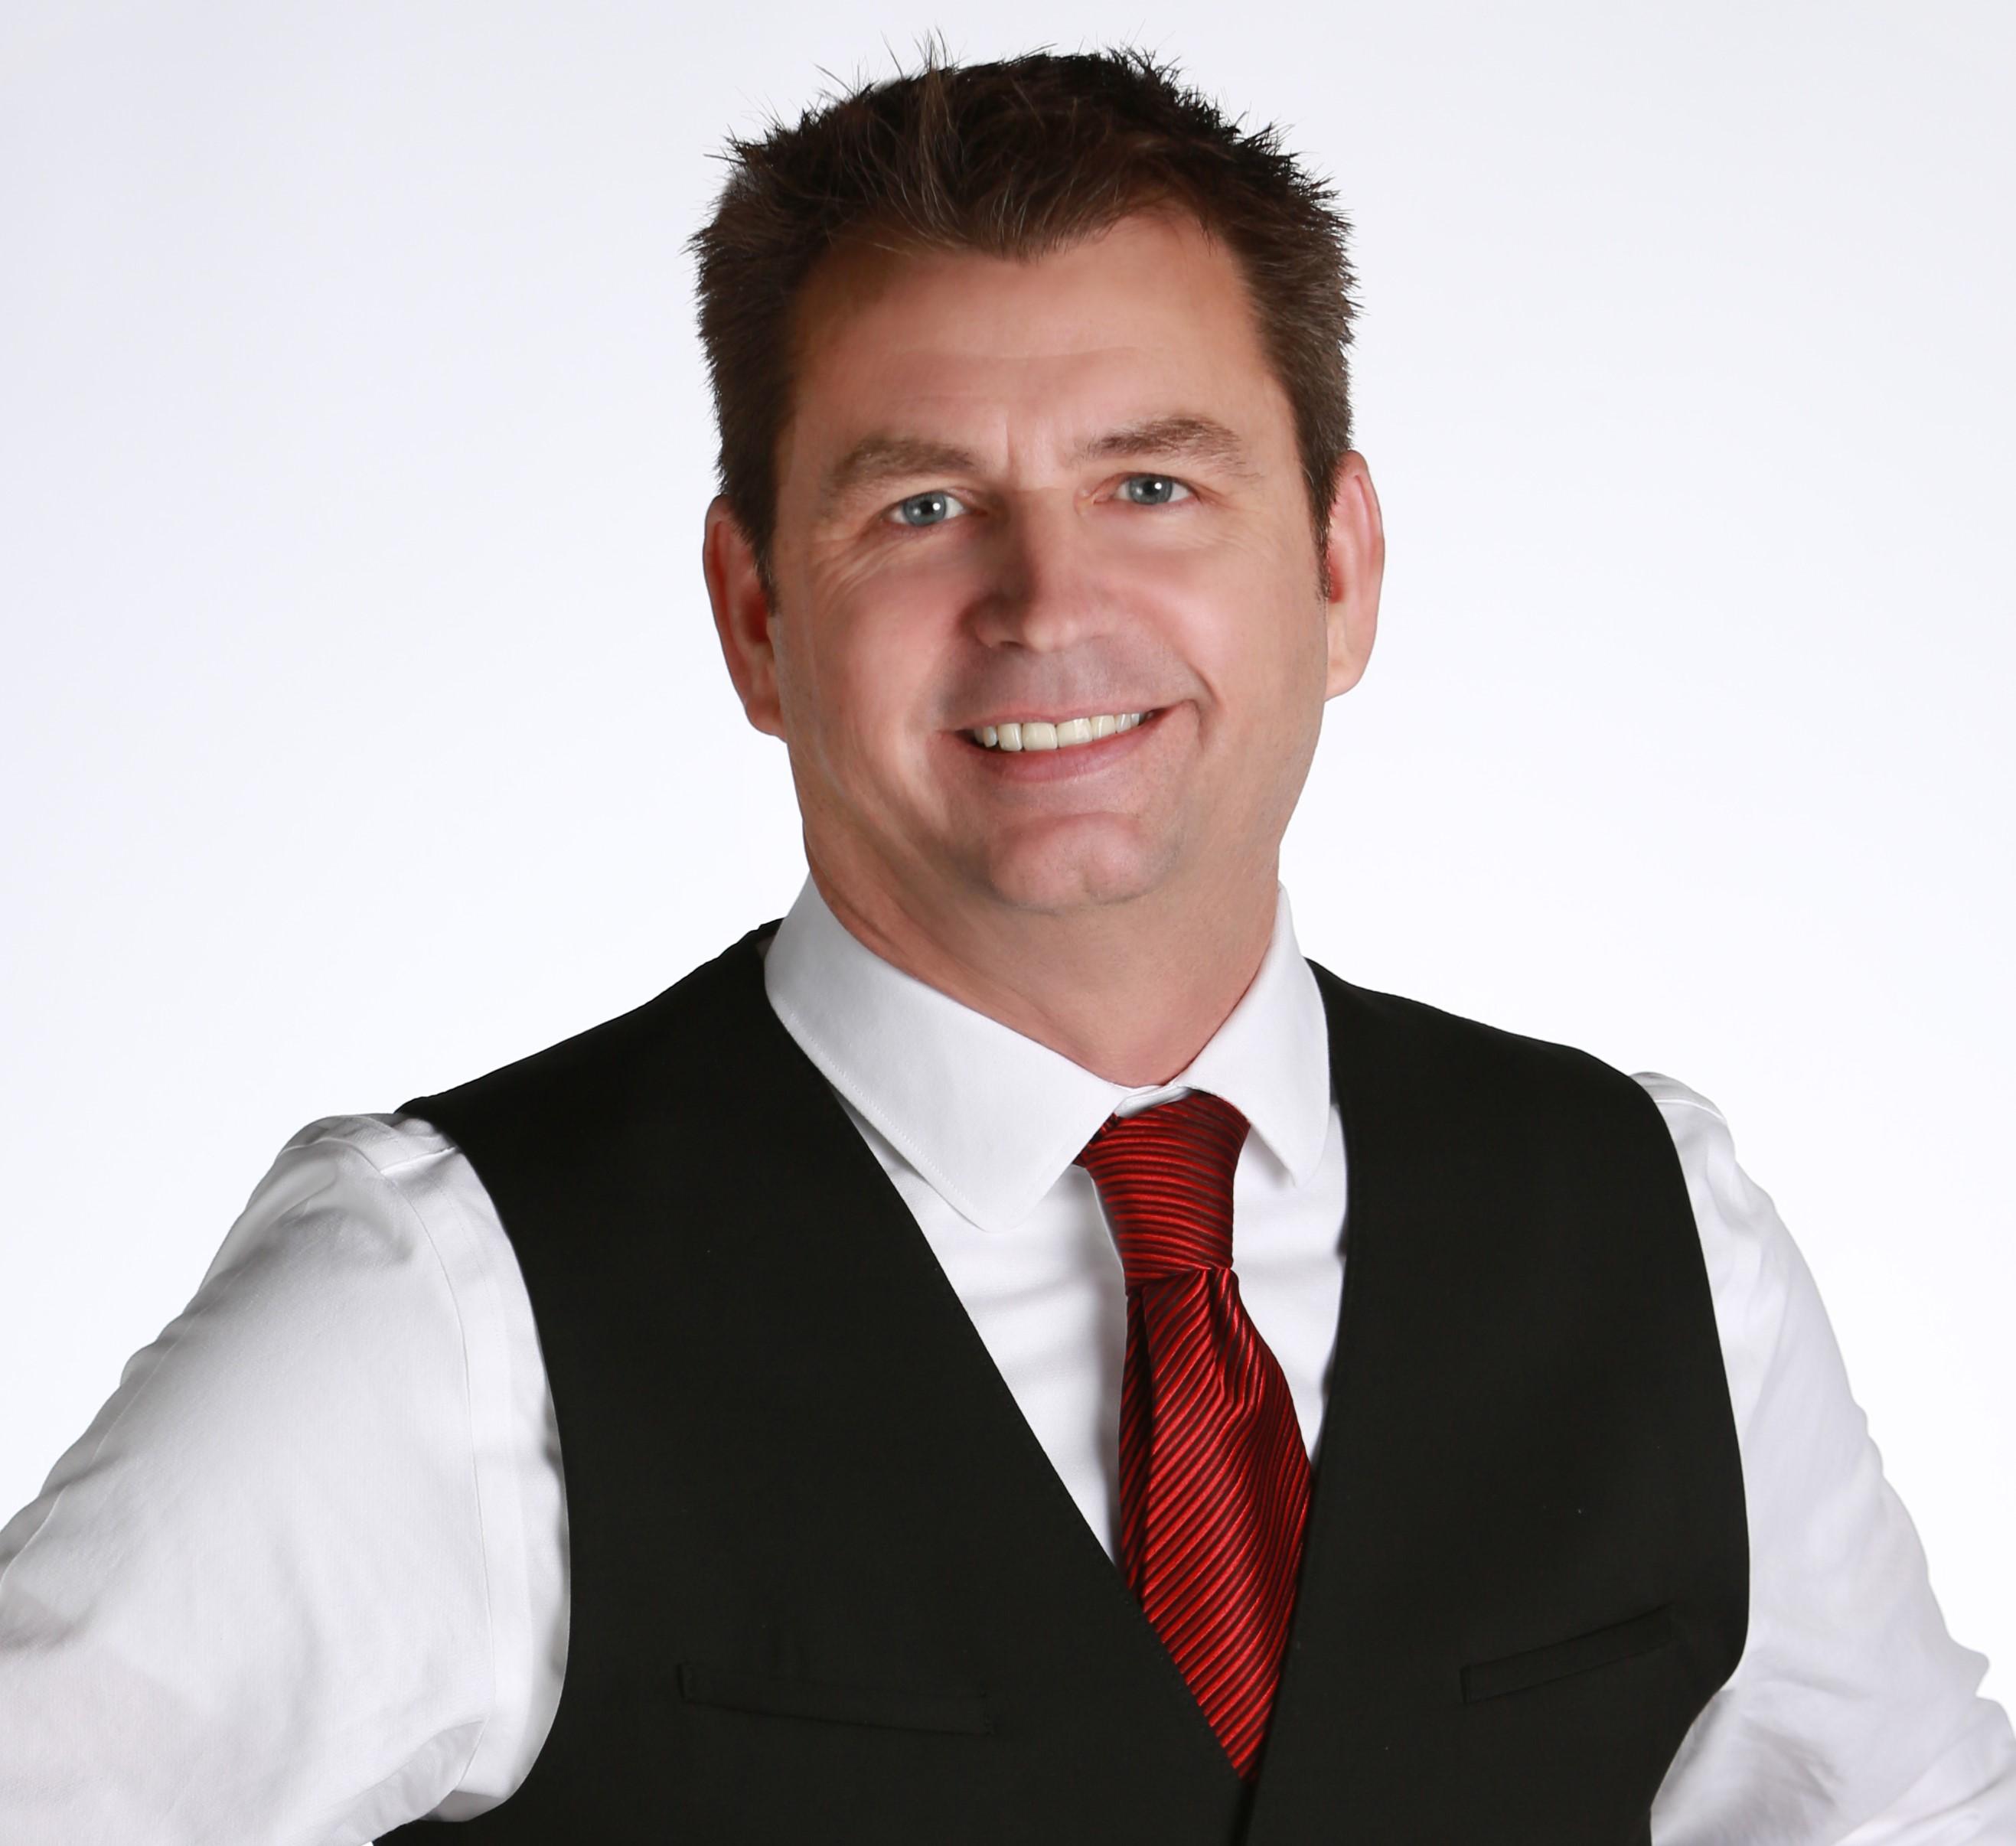 Patrick Minskey MBA, CFP®, AAMS®, financial advisor Appleton WI